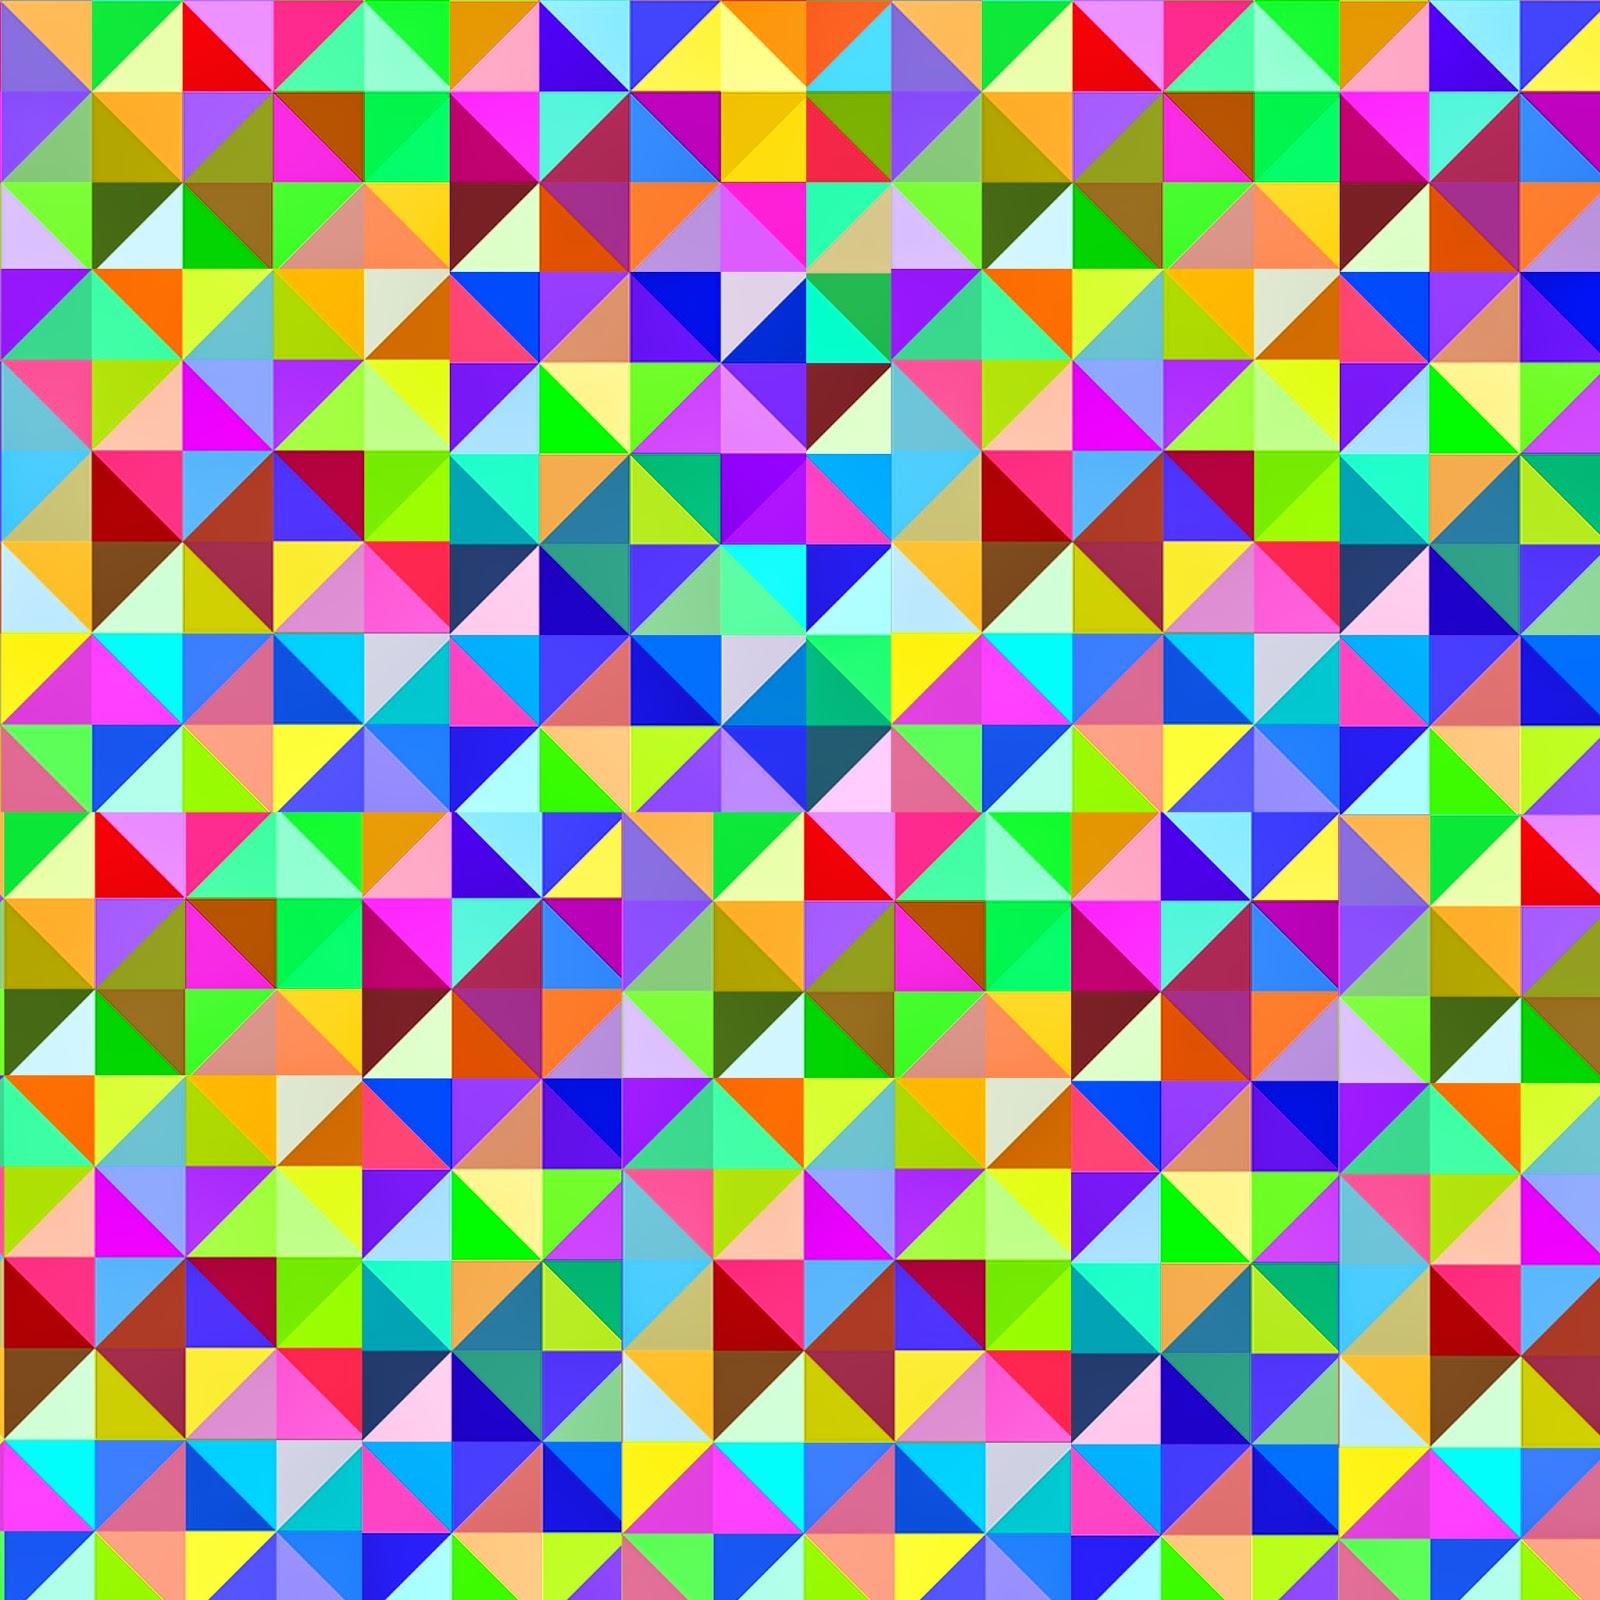 Triangle Geometric Pattern The Image